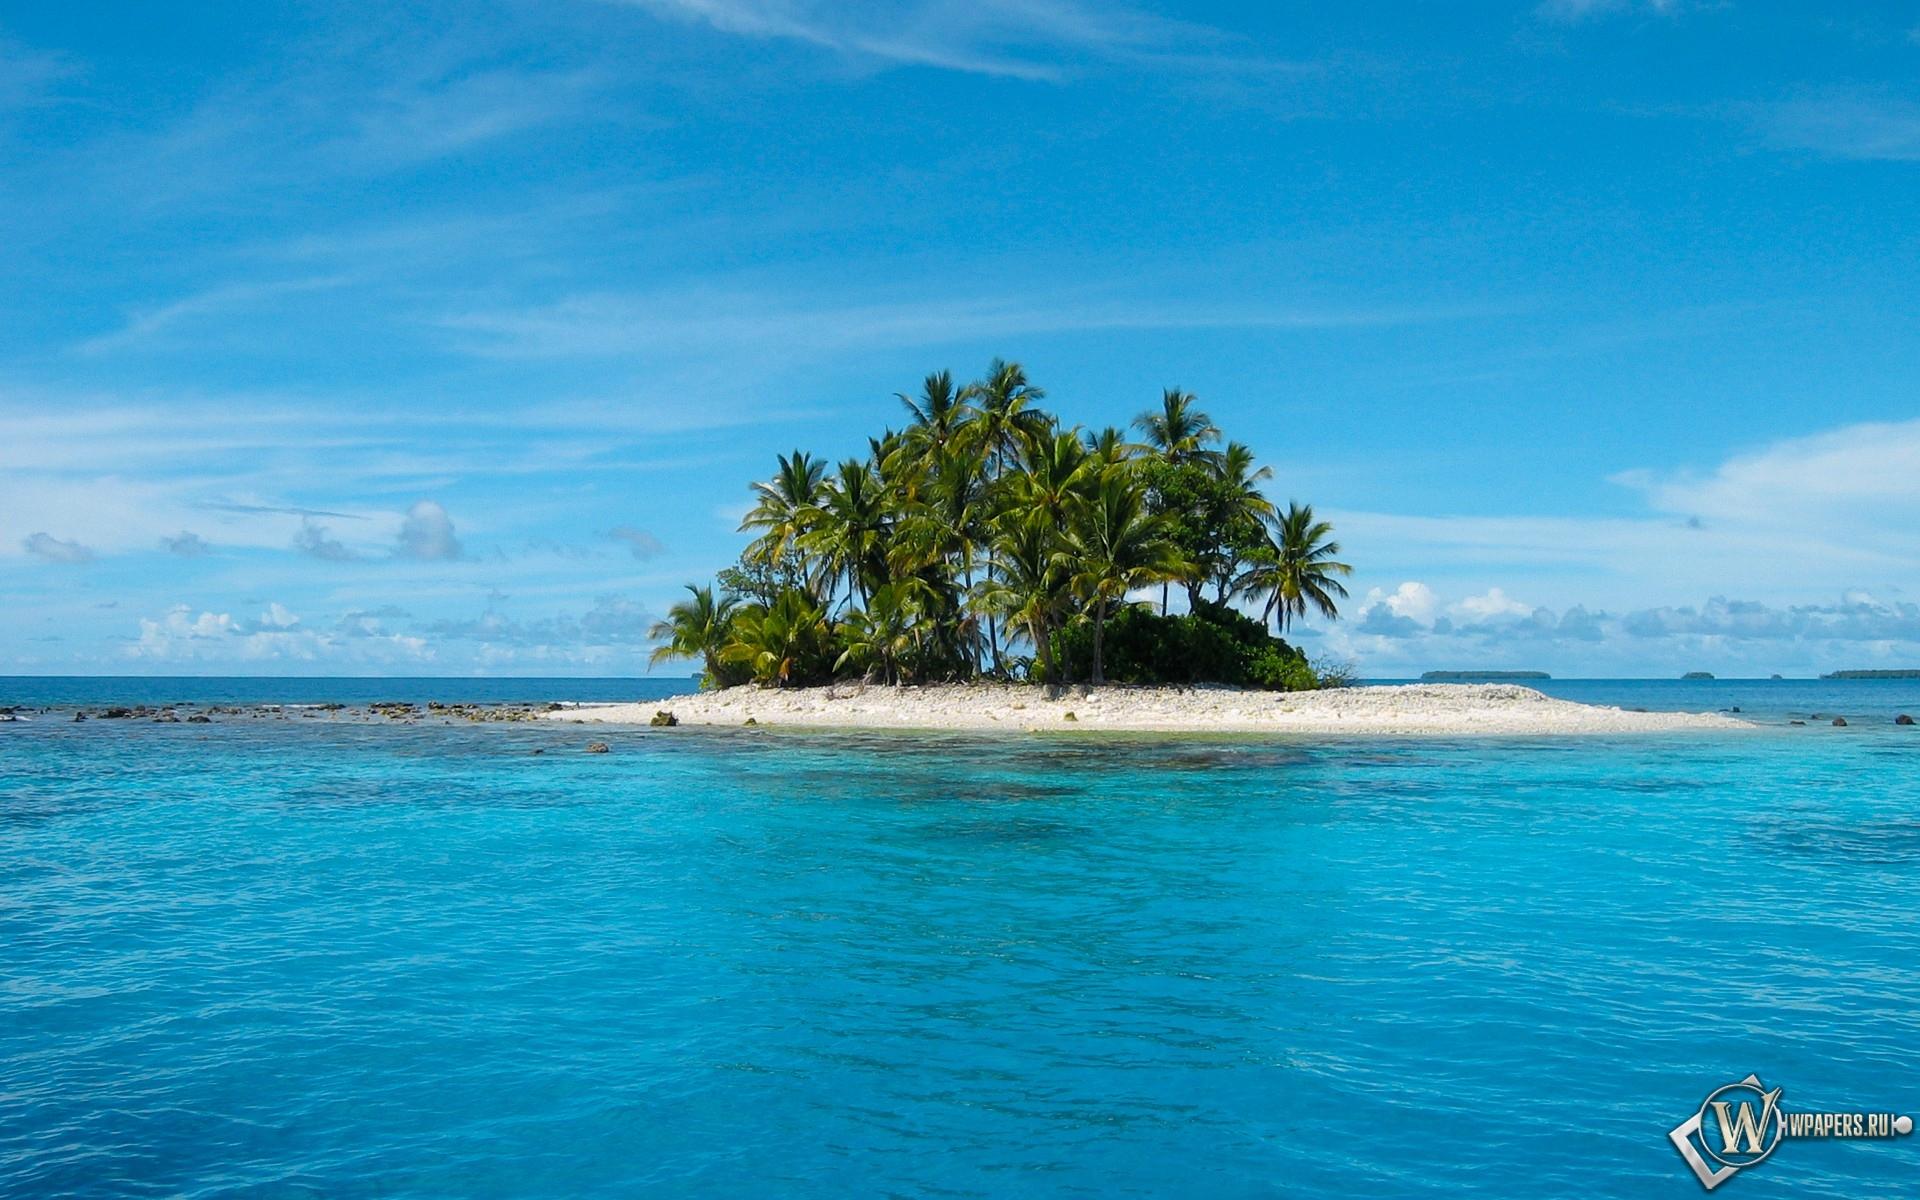 Райский островок 1920x1200